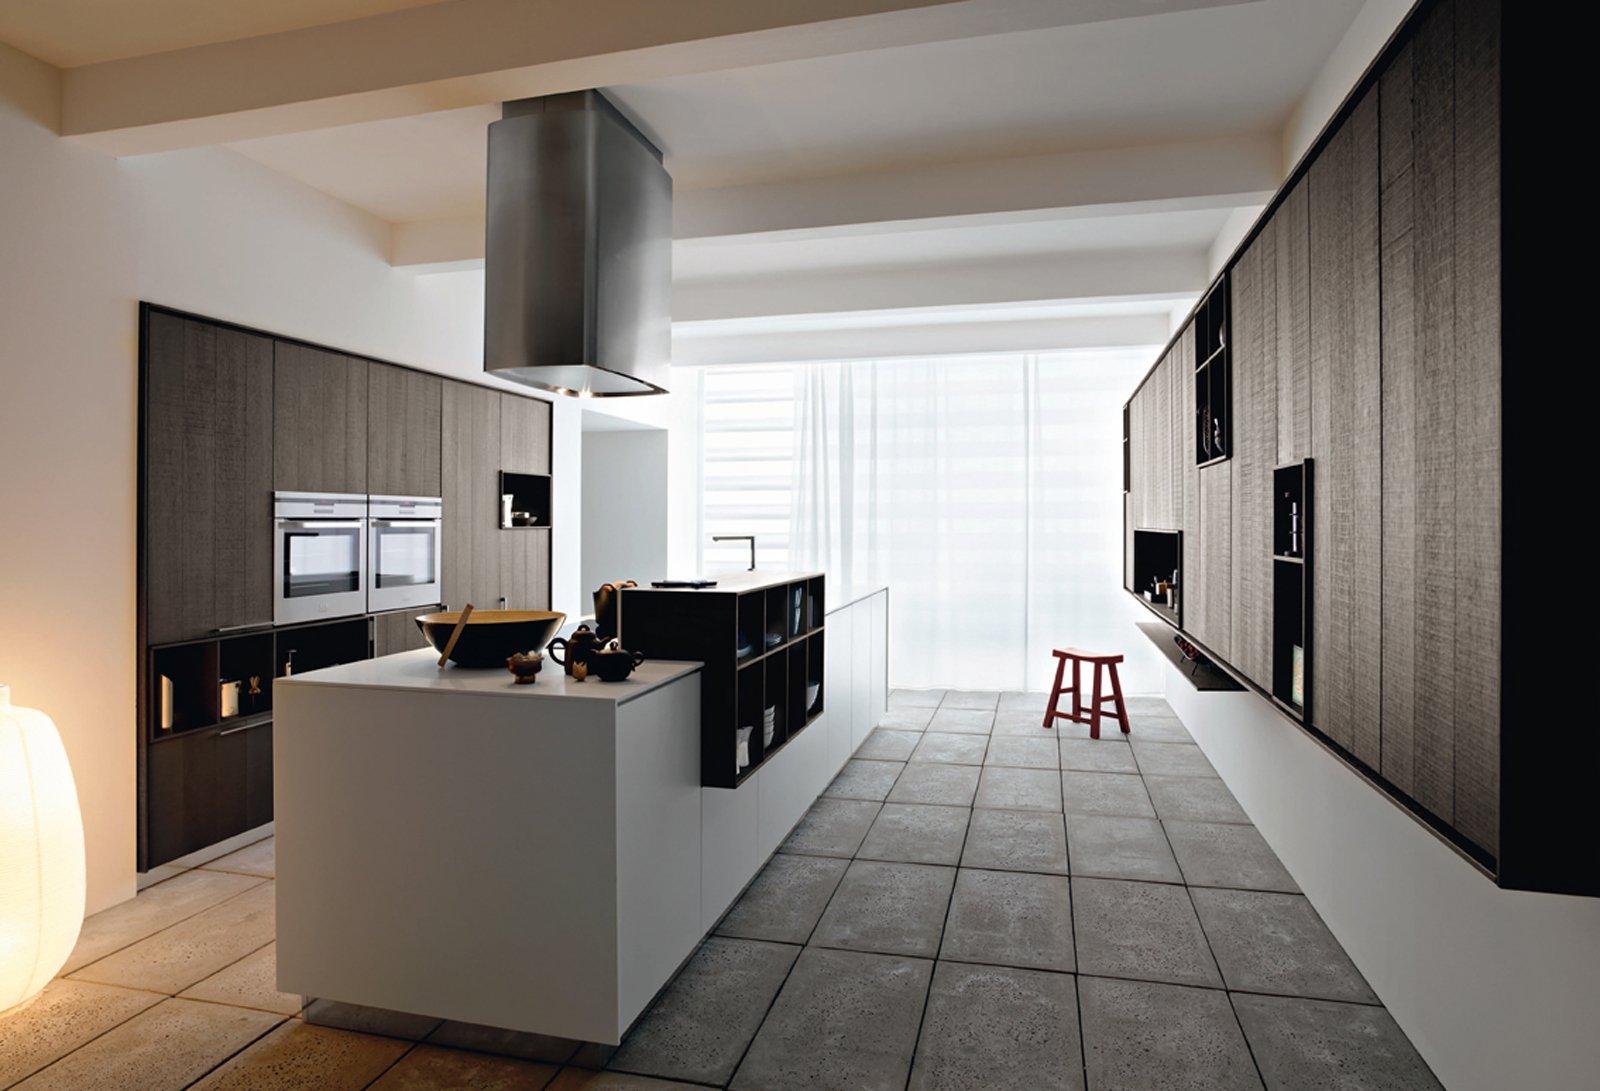 La cucina Kalea di Cesar è caratterizzata da un elegante e audace ...